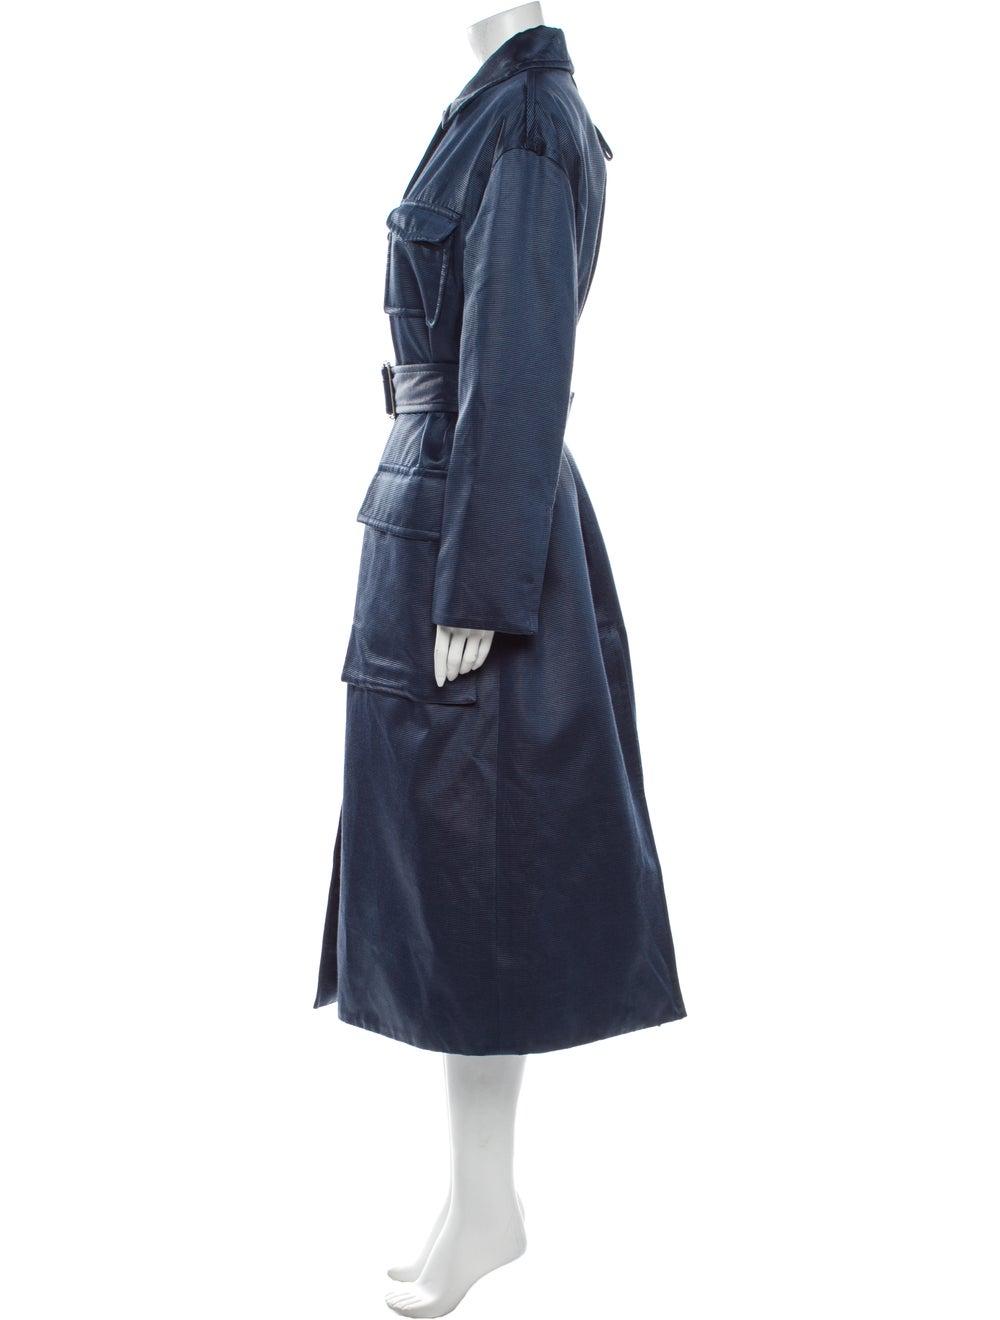 Moncler Genius Marigold Striped Trench Coat w/ Ta… - image 2